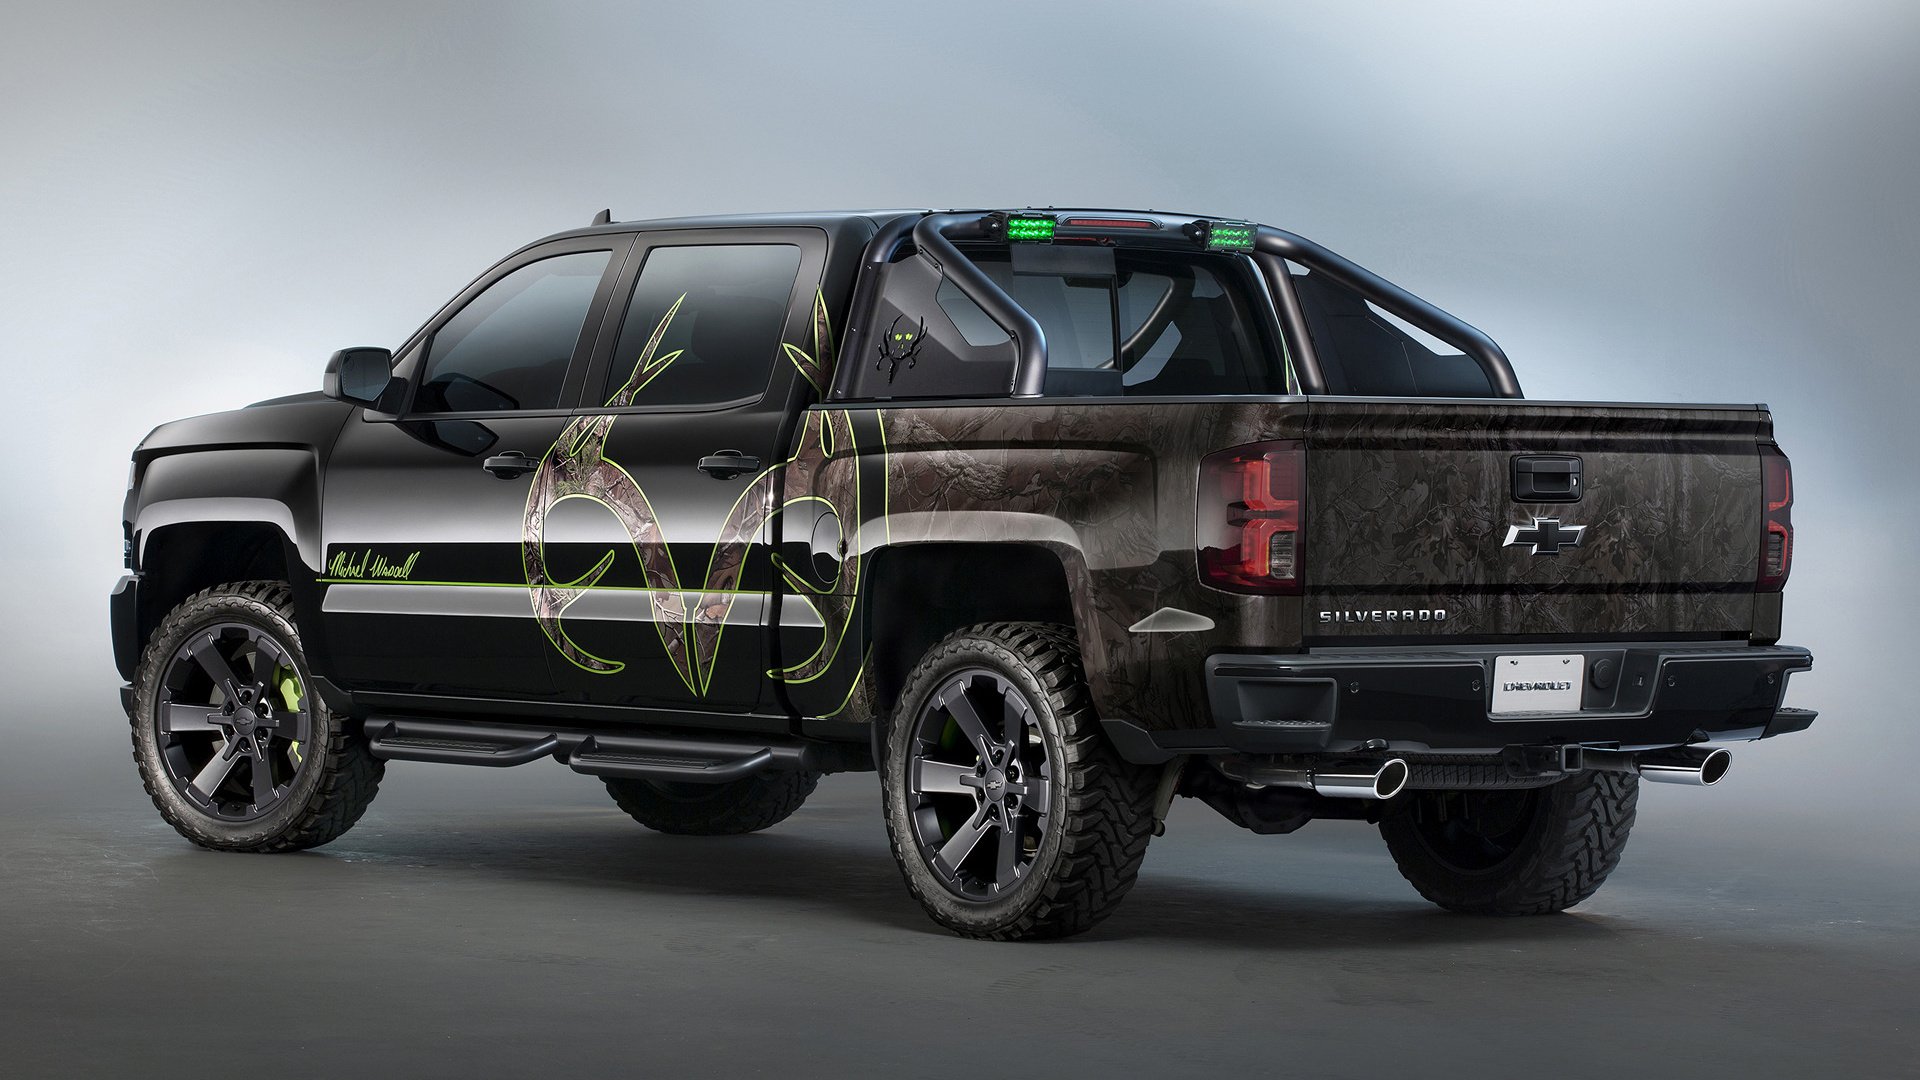 Chevrolet silverado realtree bone collector 2015 wallpapers and hd images car pixel